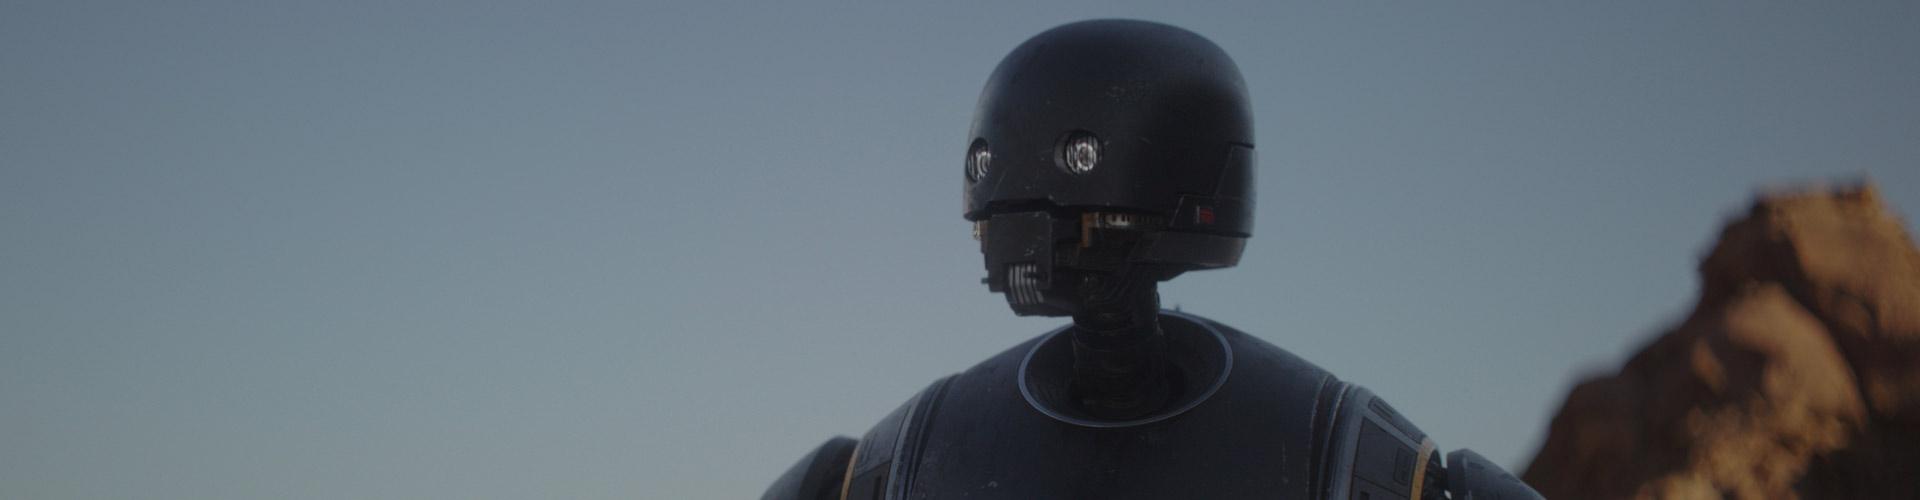 star-wars-droid-header.jpg